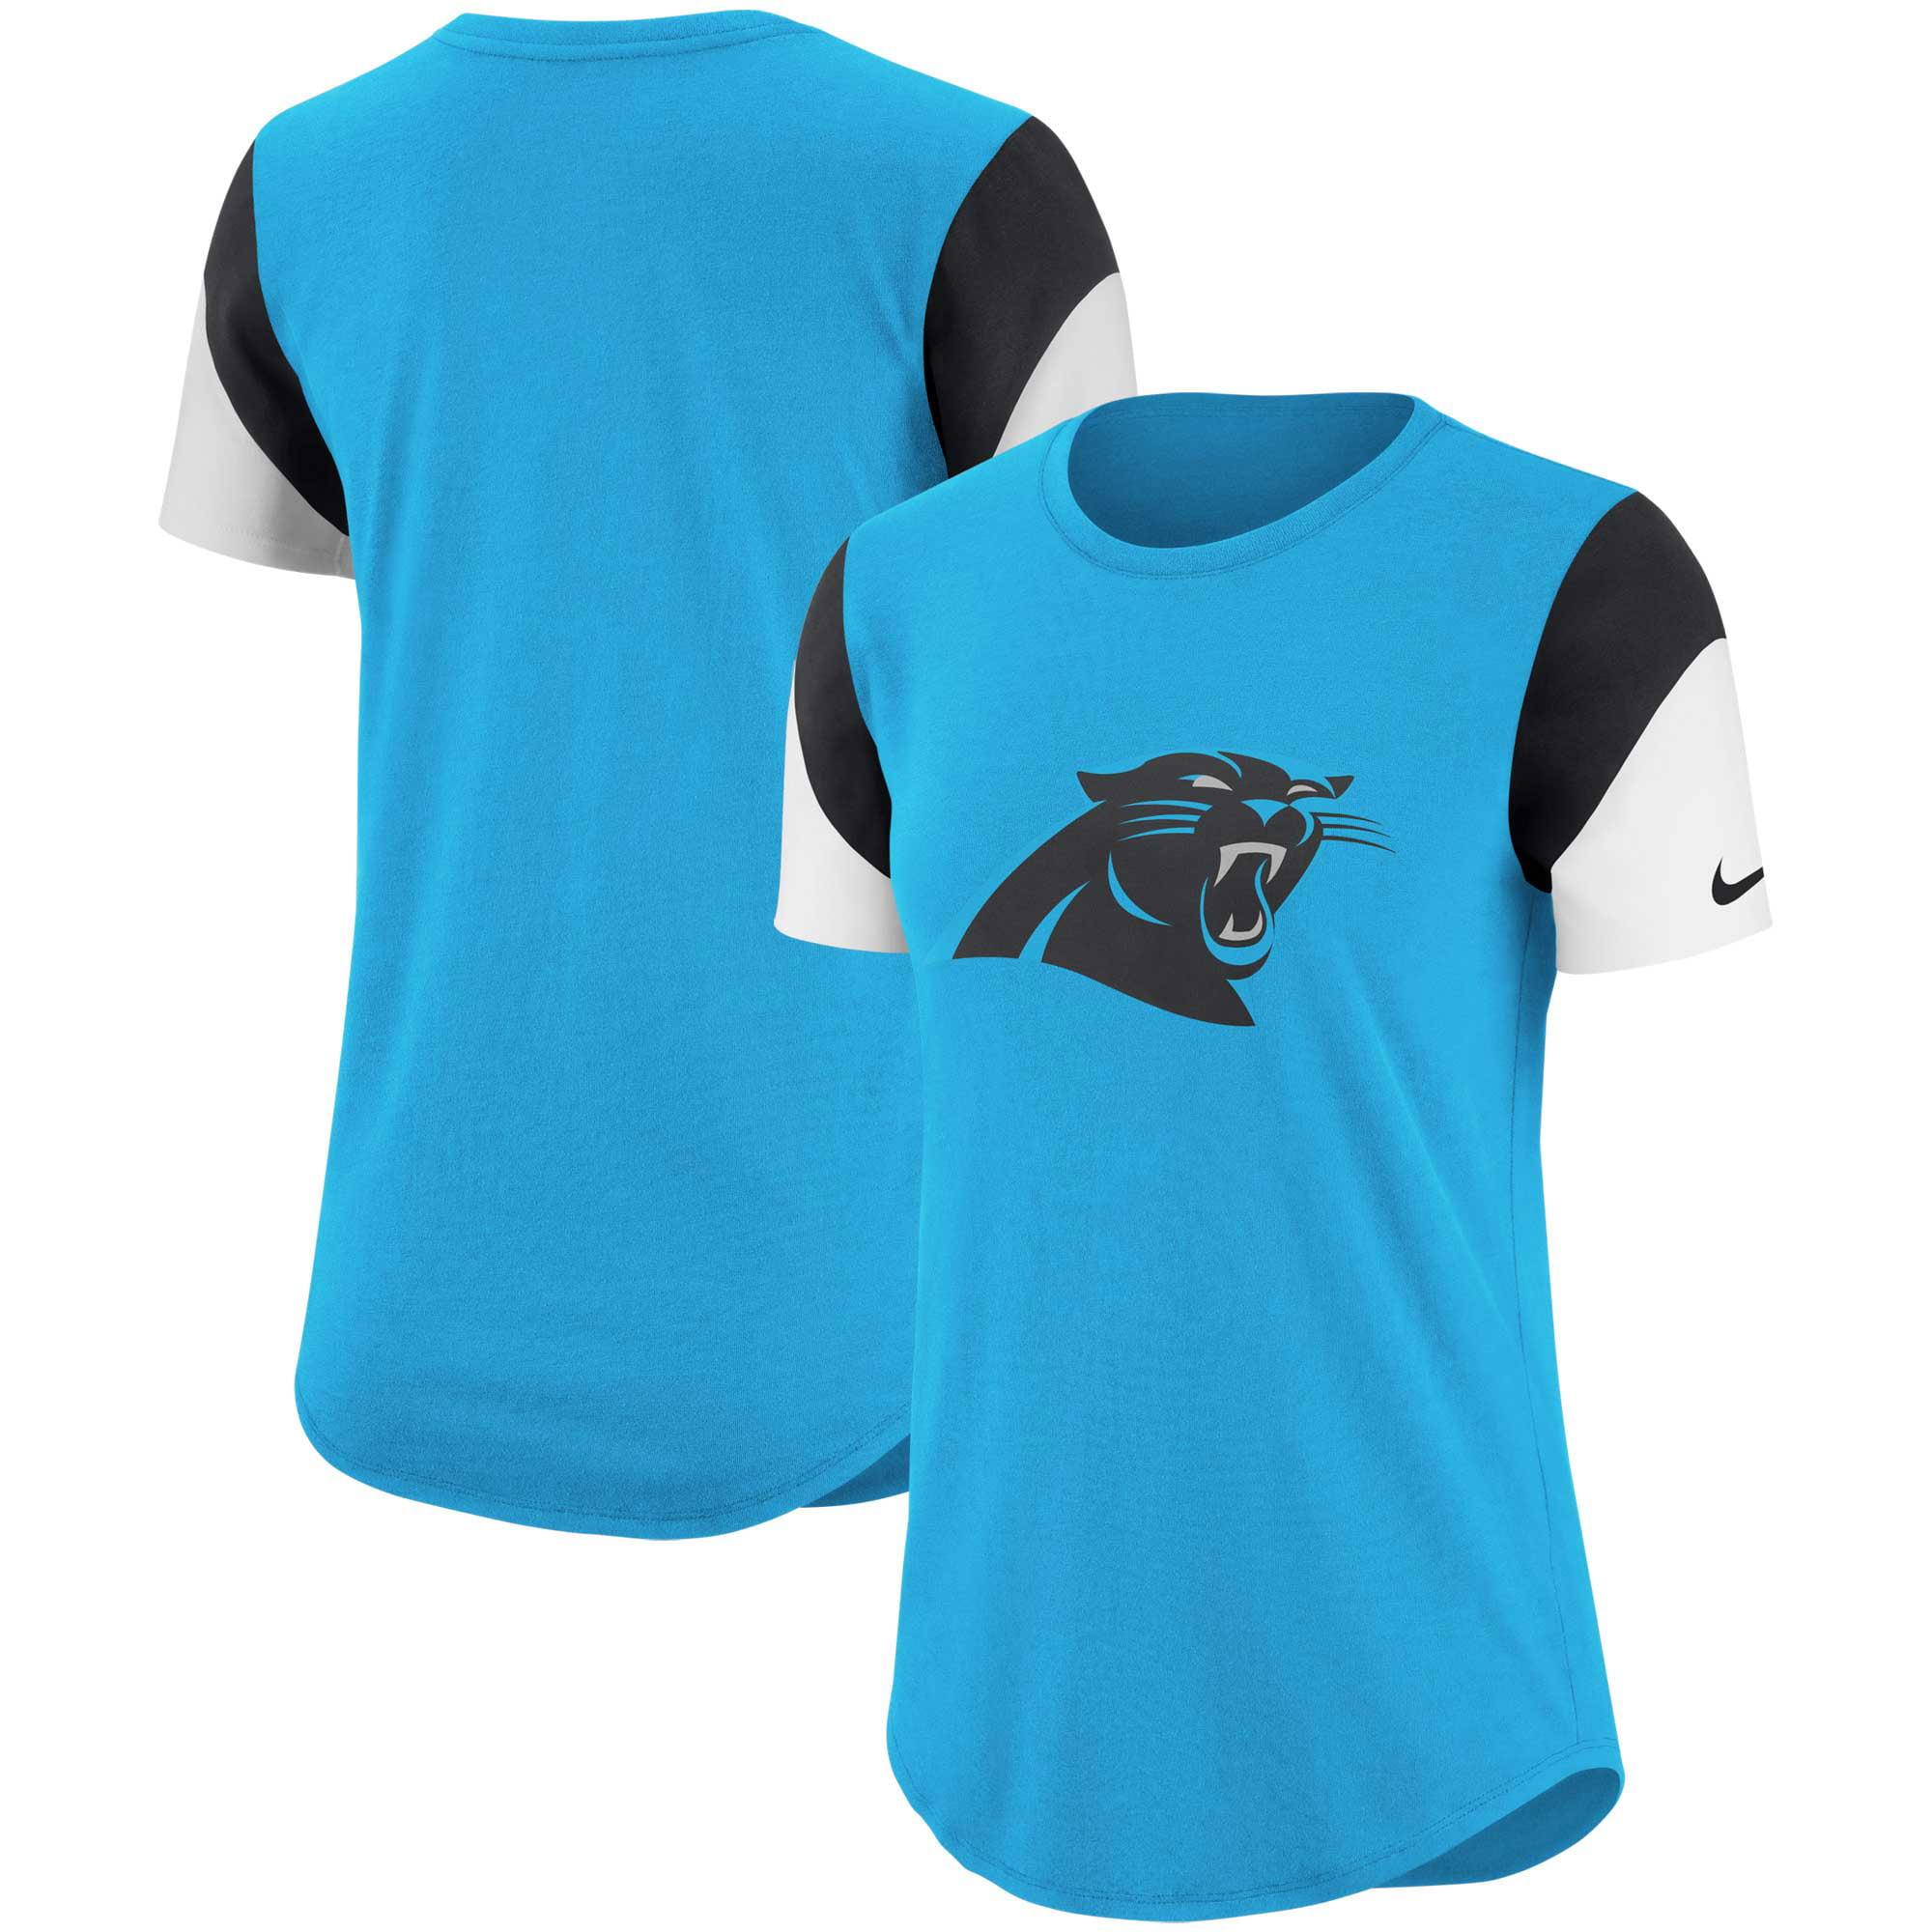 Carolina Panthers Nike Women's Tri-Blend Team Fan T-Shirt - Blue/Black